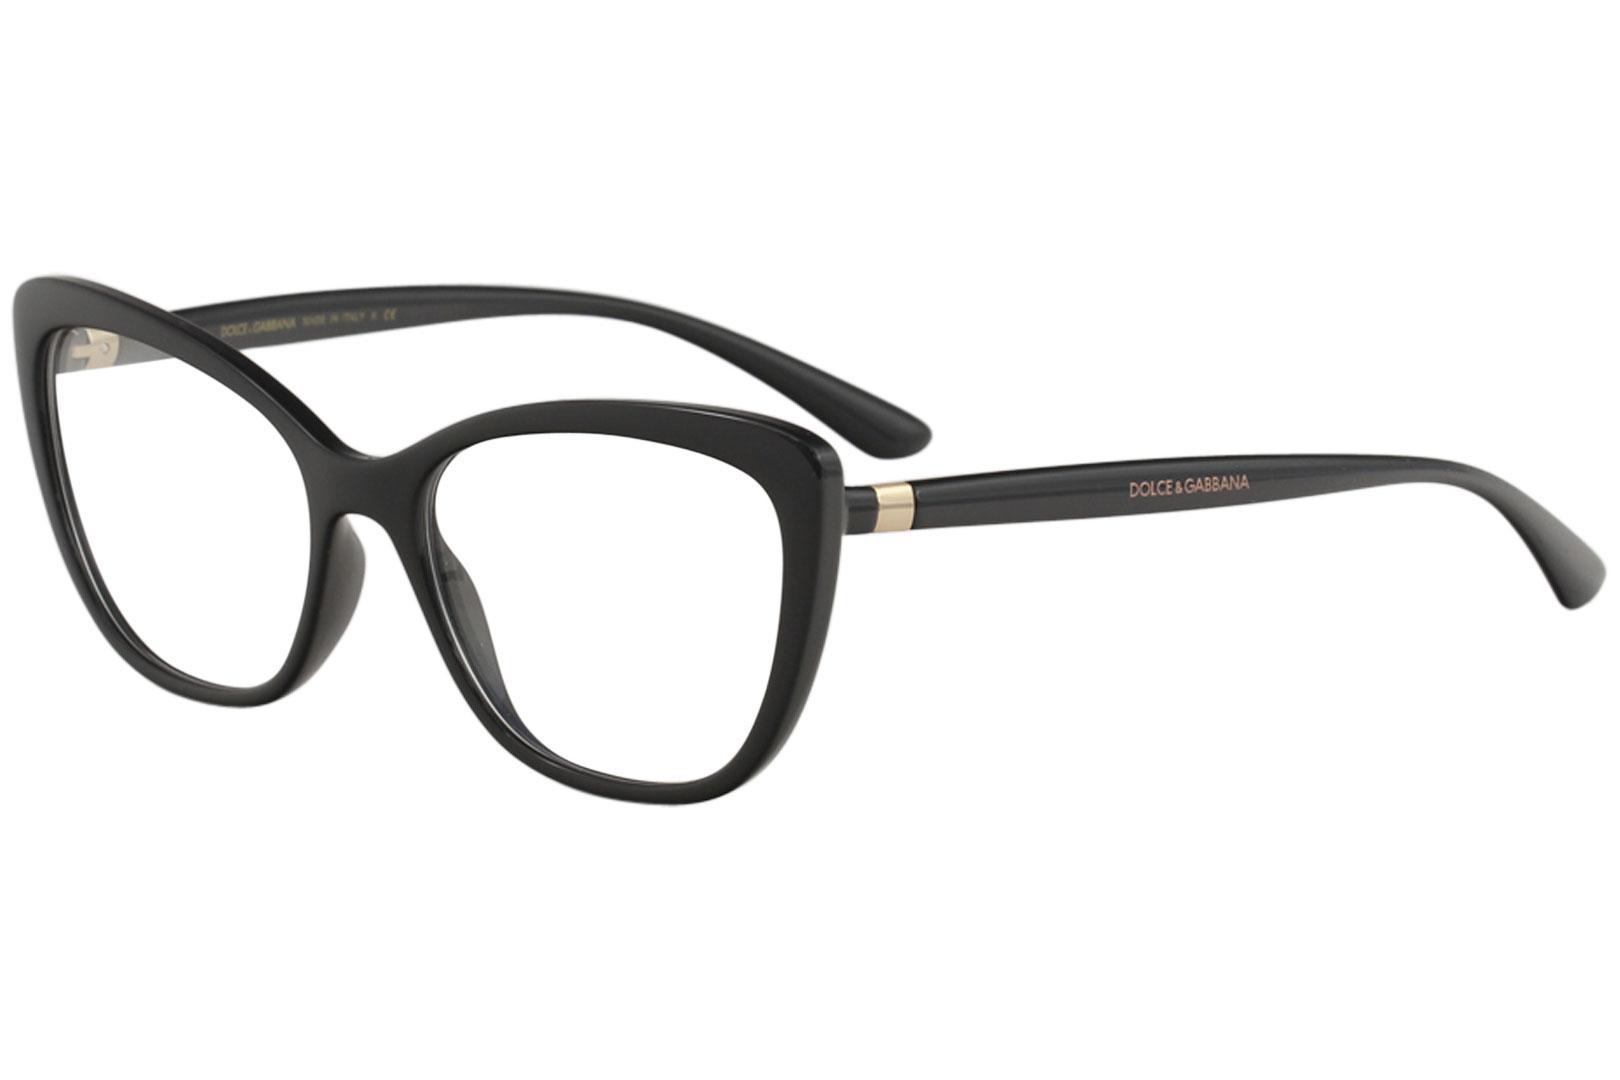 c5c0f8aecba Details about Dolce   Gabbana Eyeglasses D G DG5039 DG 5039 501 Black  Optical Frame 54mm